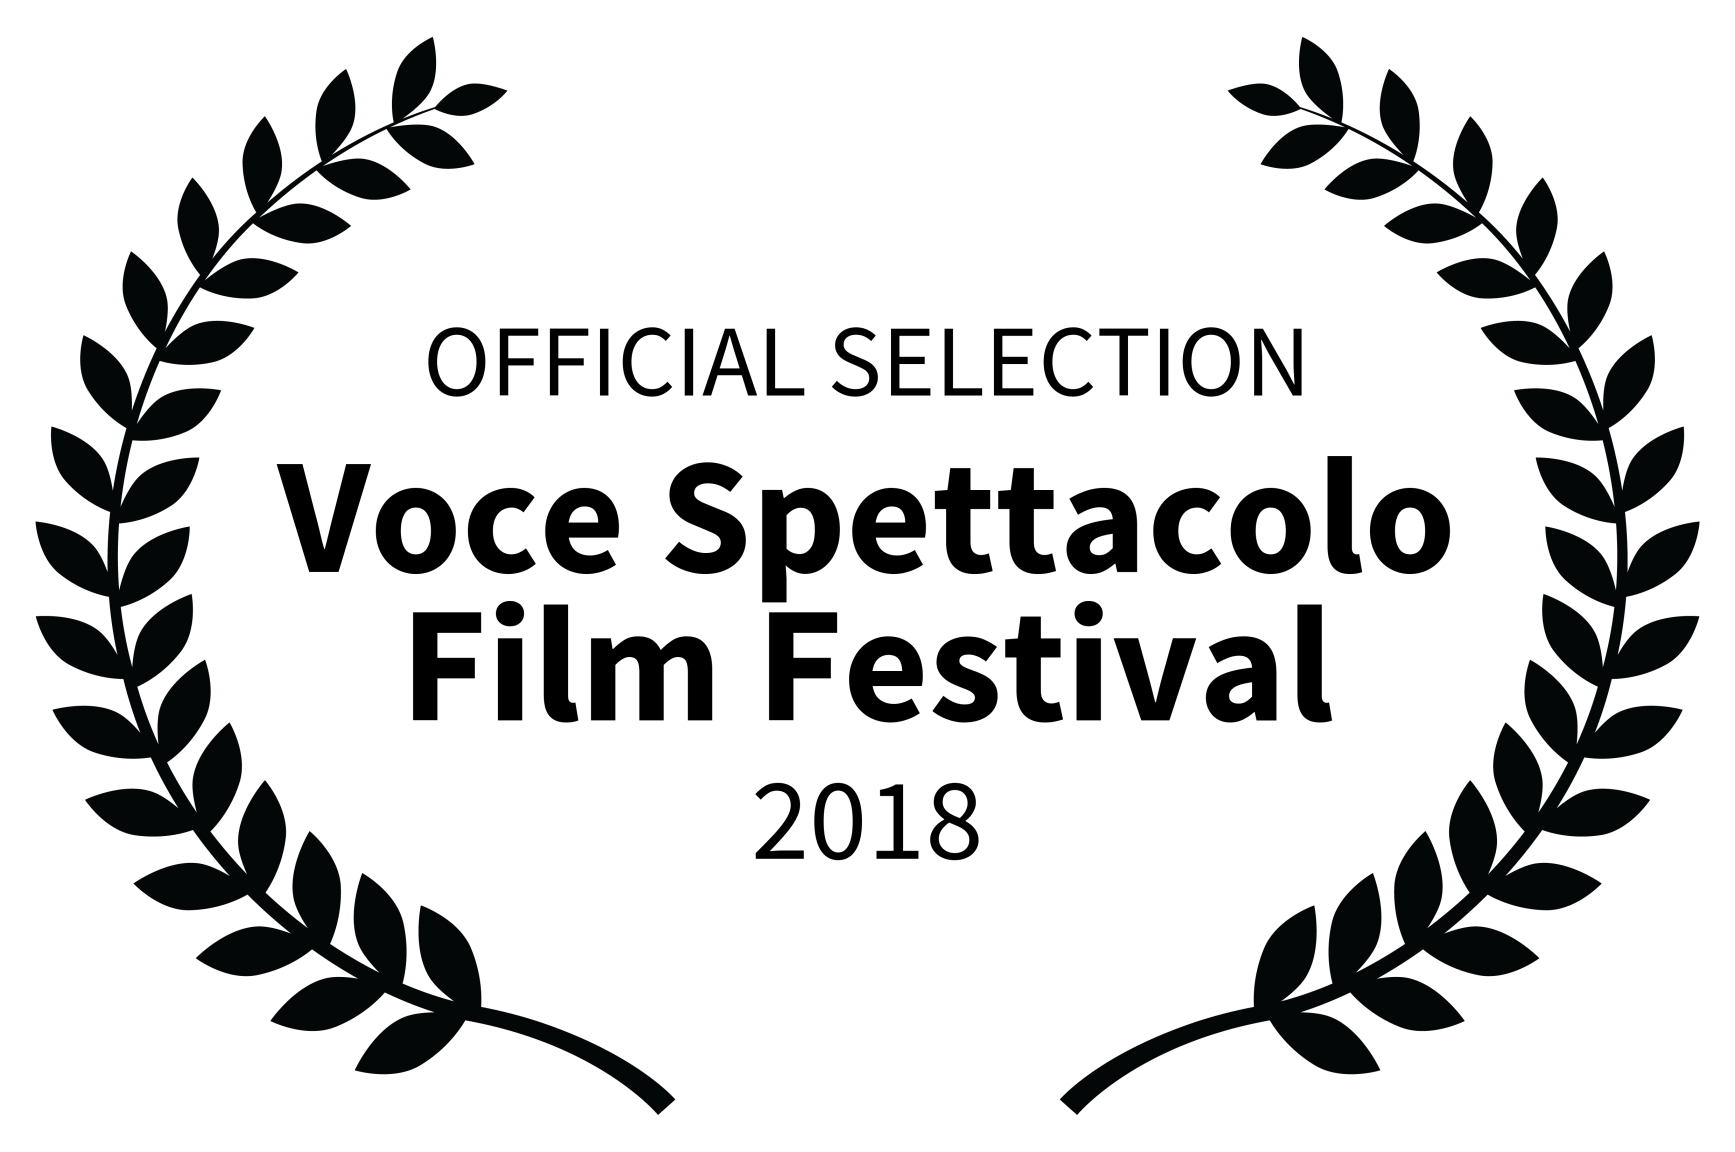 OFFICIAL SELECTION - Voce Spettacolo Film Festival - 2018